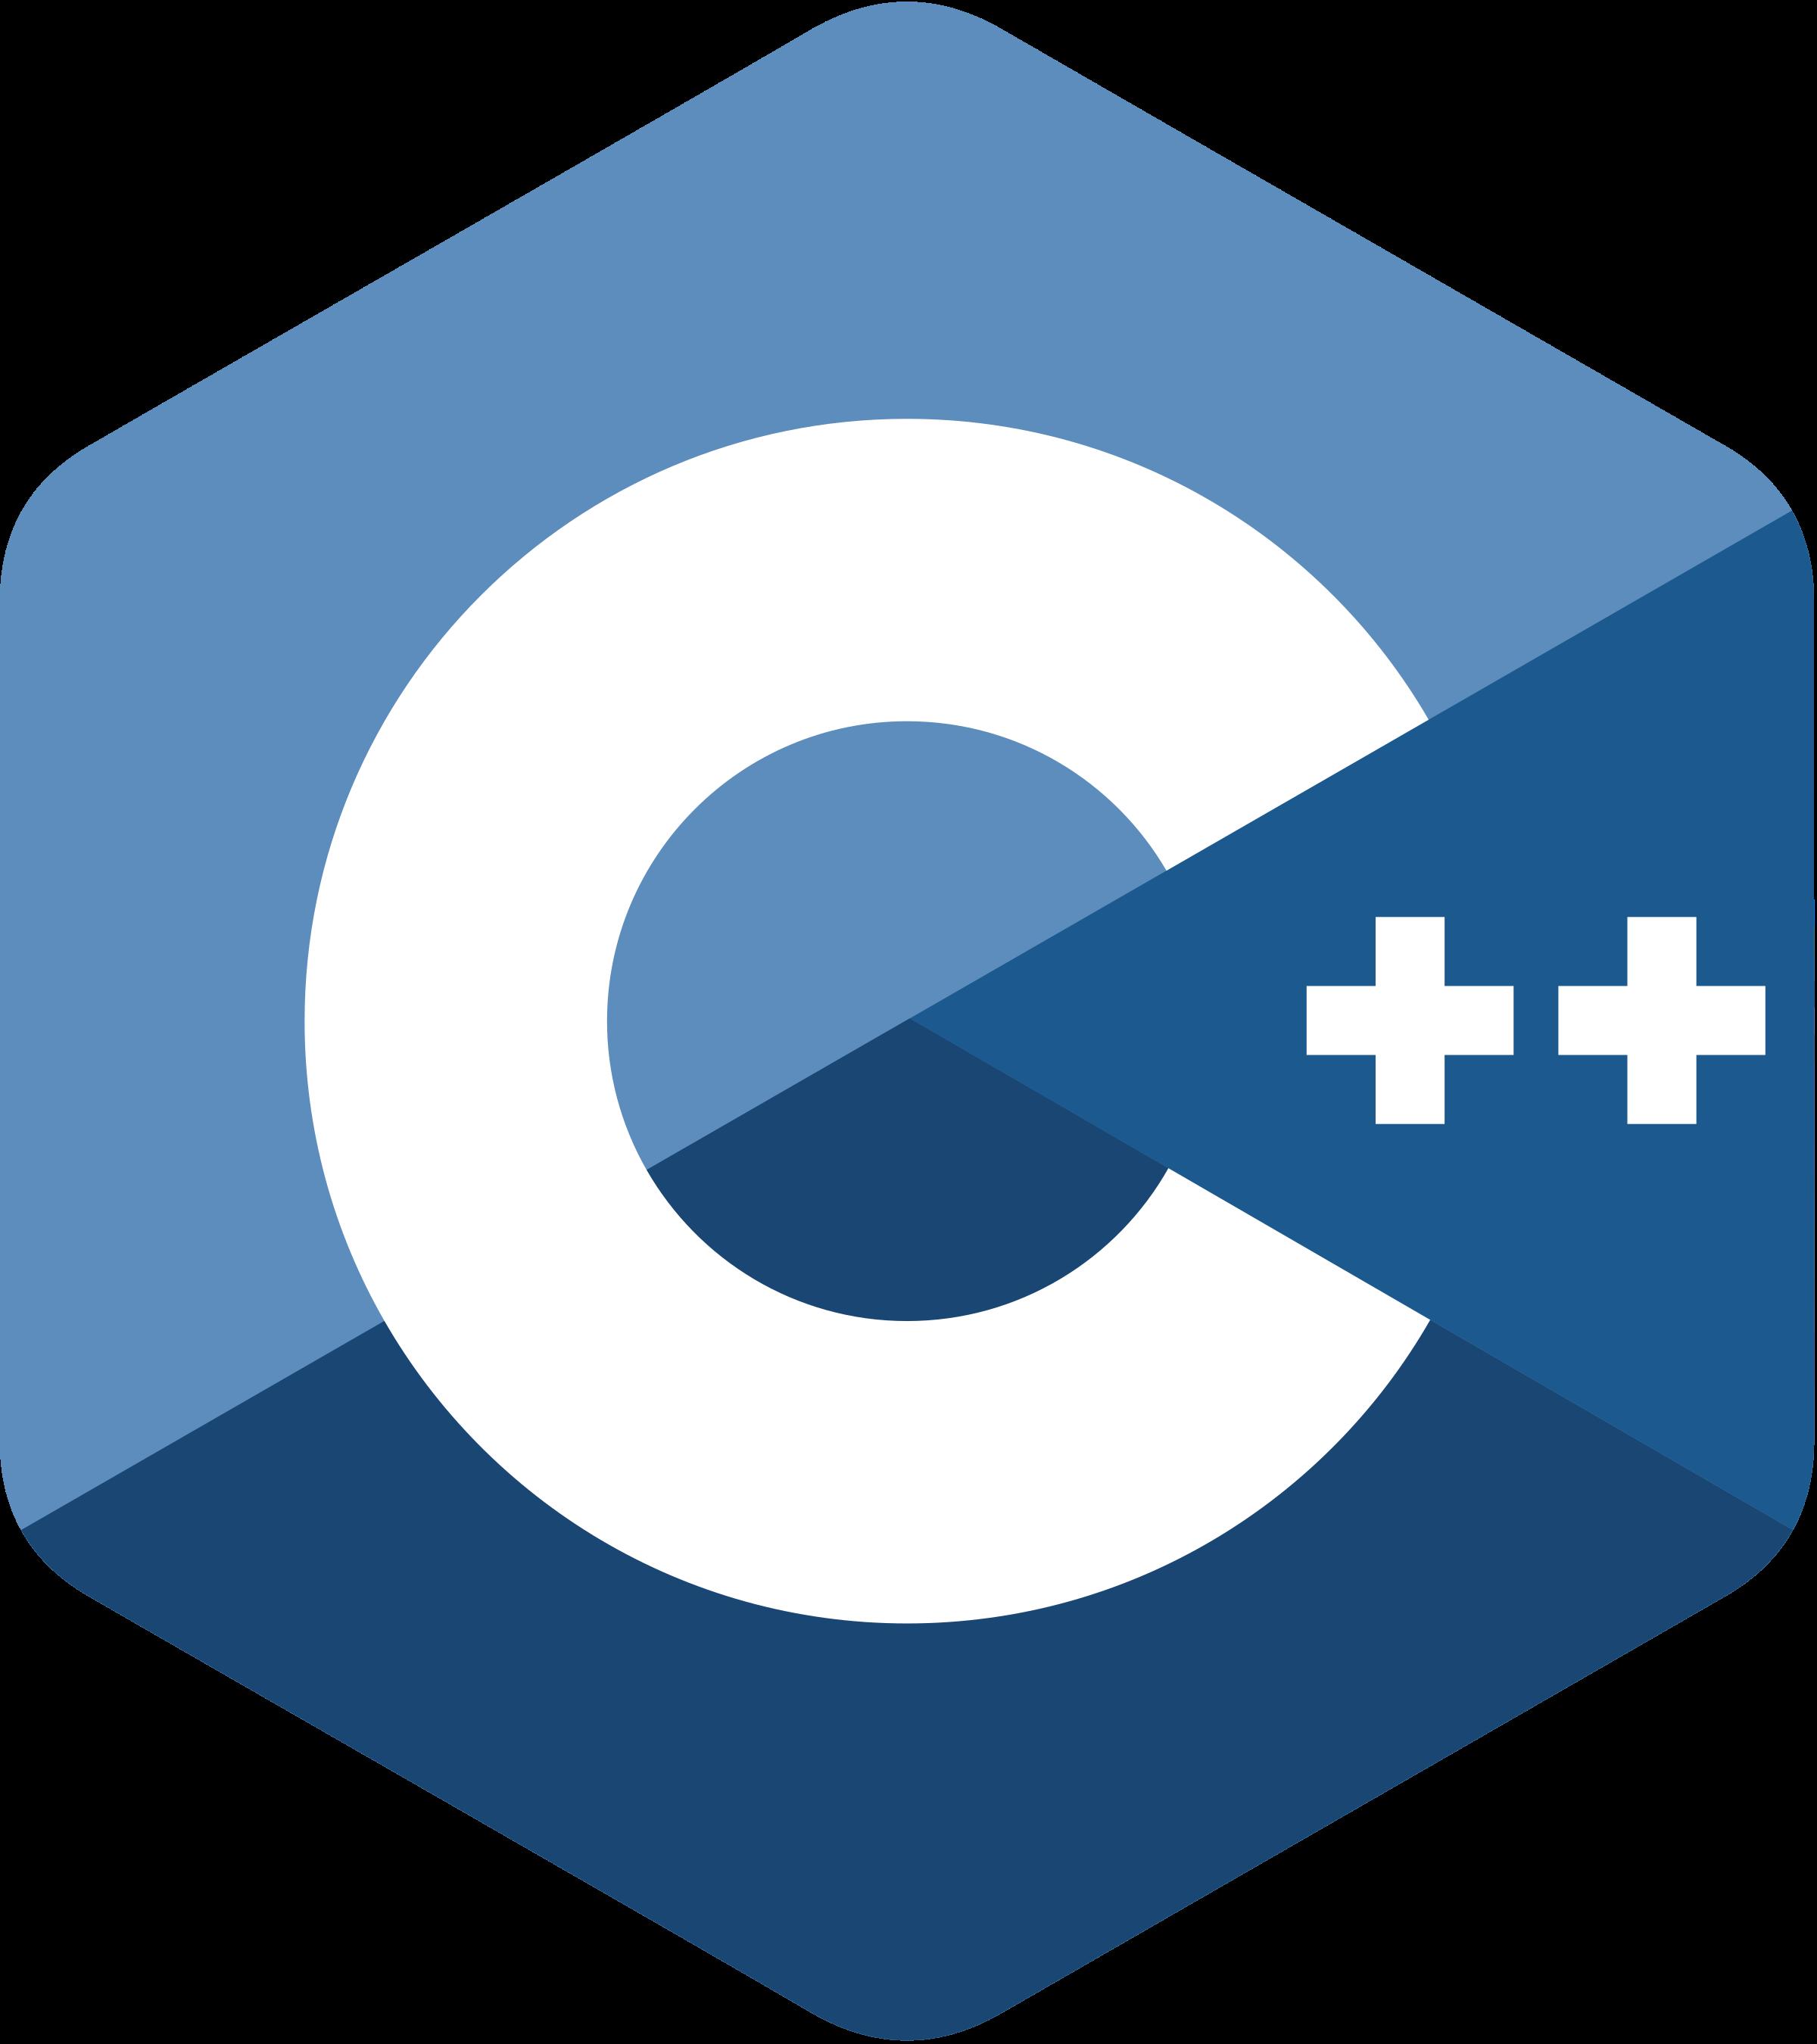 C Logo: C++ Logo PNG Transparent & SVG Vector